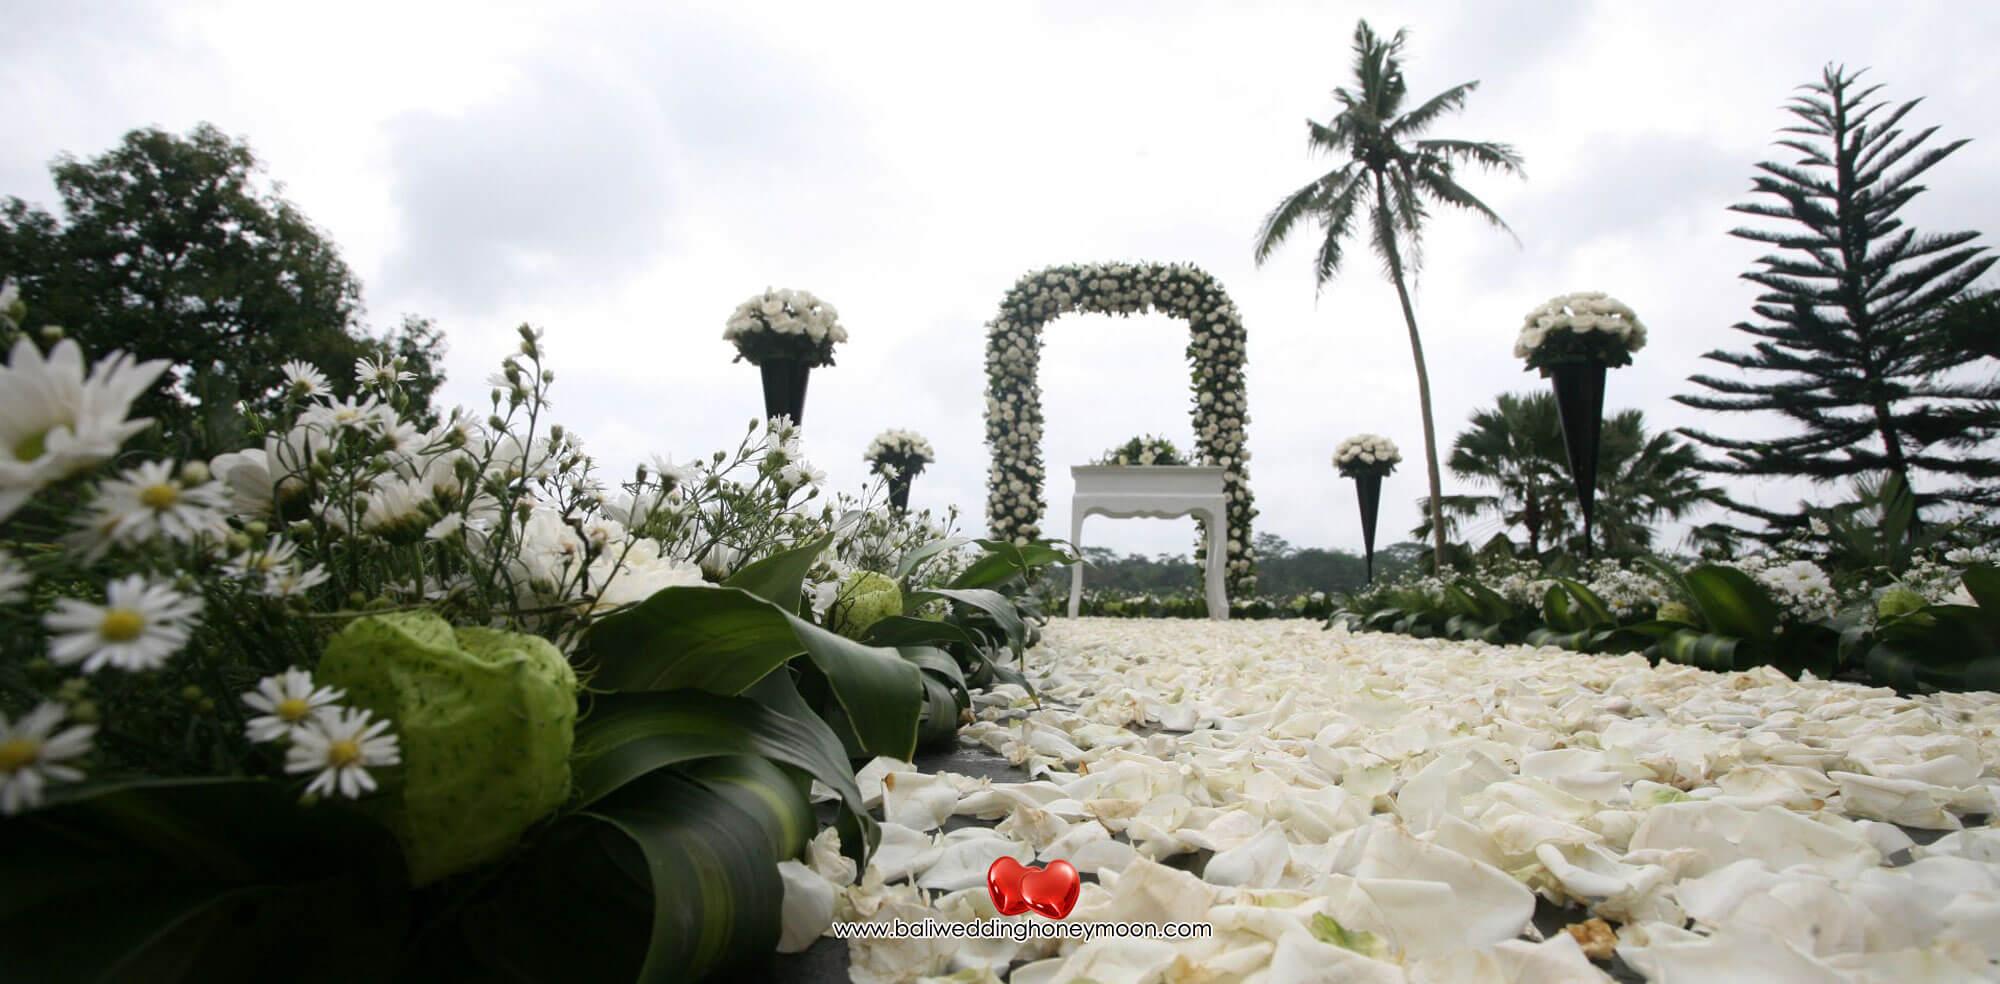 kupukupubarongubudbali-weddingvenuebali-uniquebaliwedding-baliweddinghoneymoon-baliweddingorganizer-baliweddingplanner-baliweddingpackage3